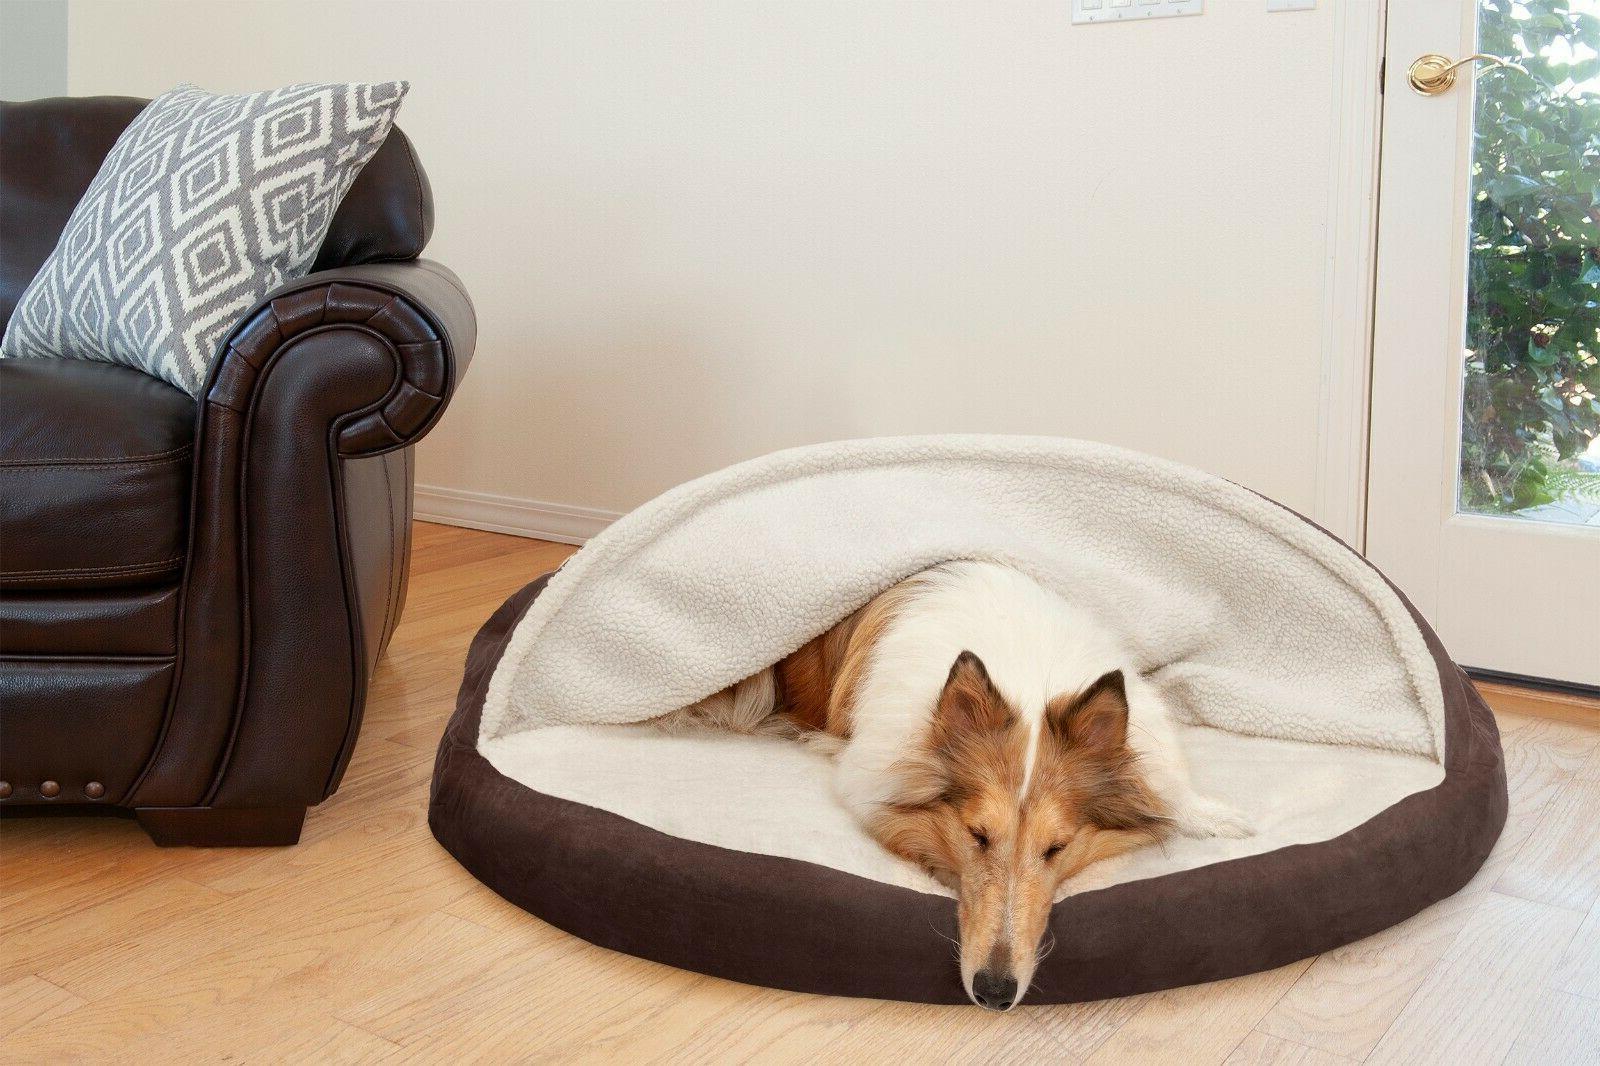 FurHaven Faux Sheepskin Snuggery Orthopedic Dog Cave Bed Pet